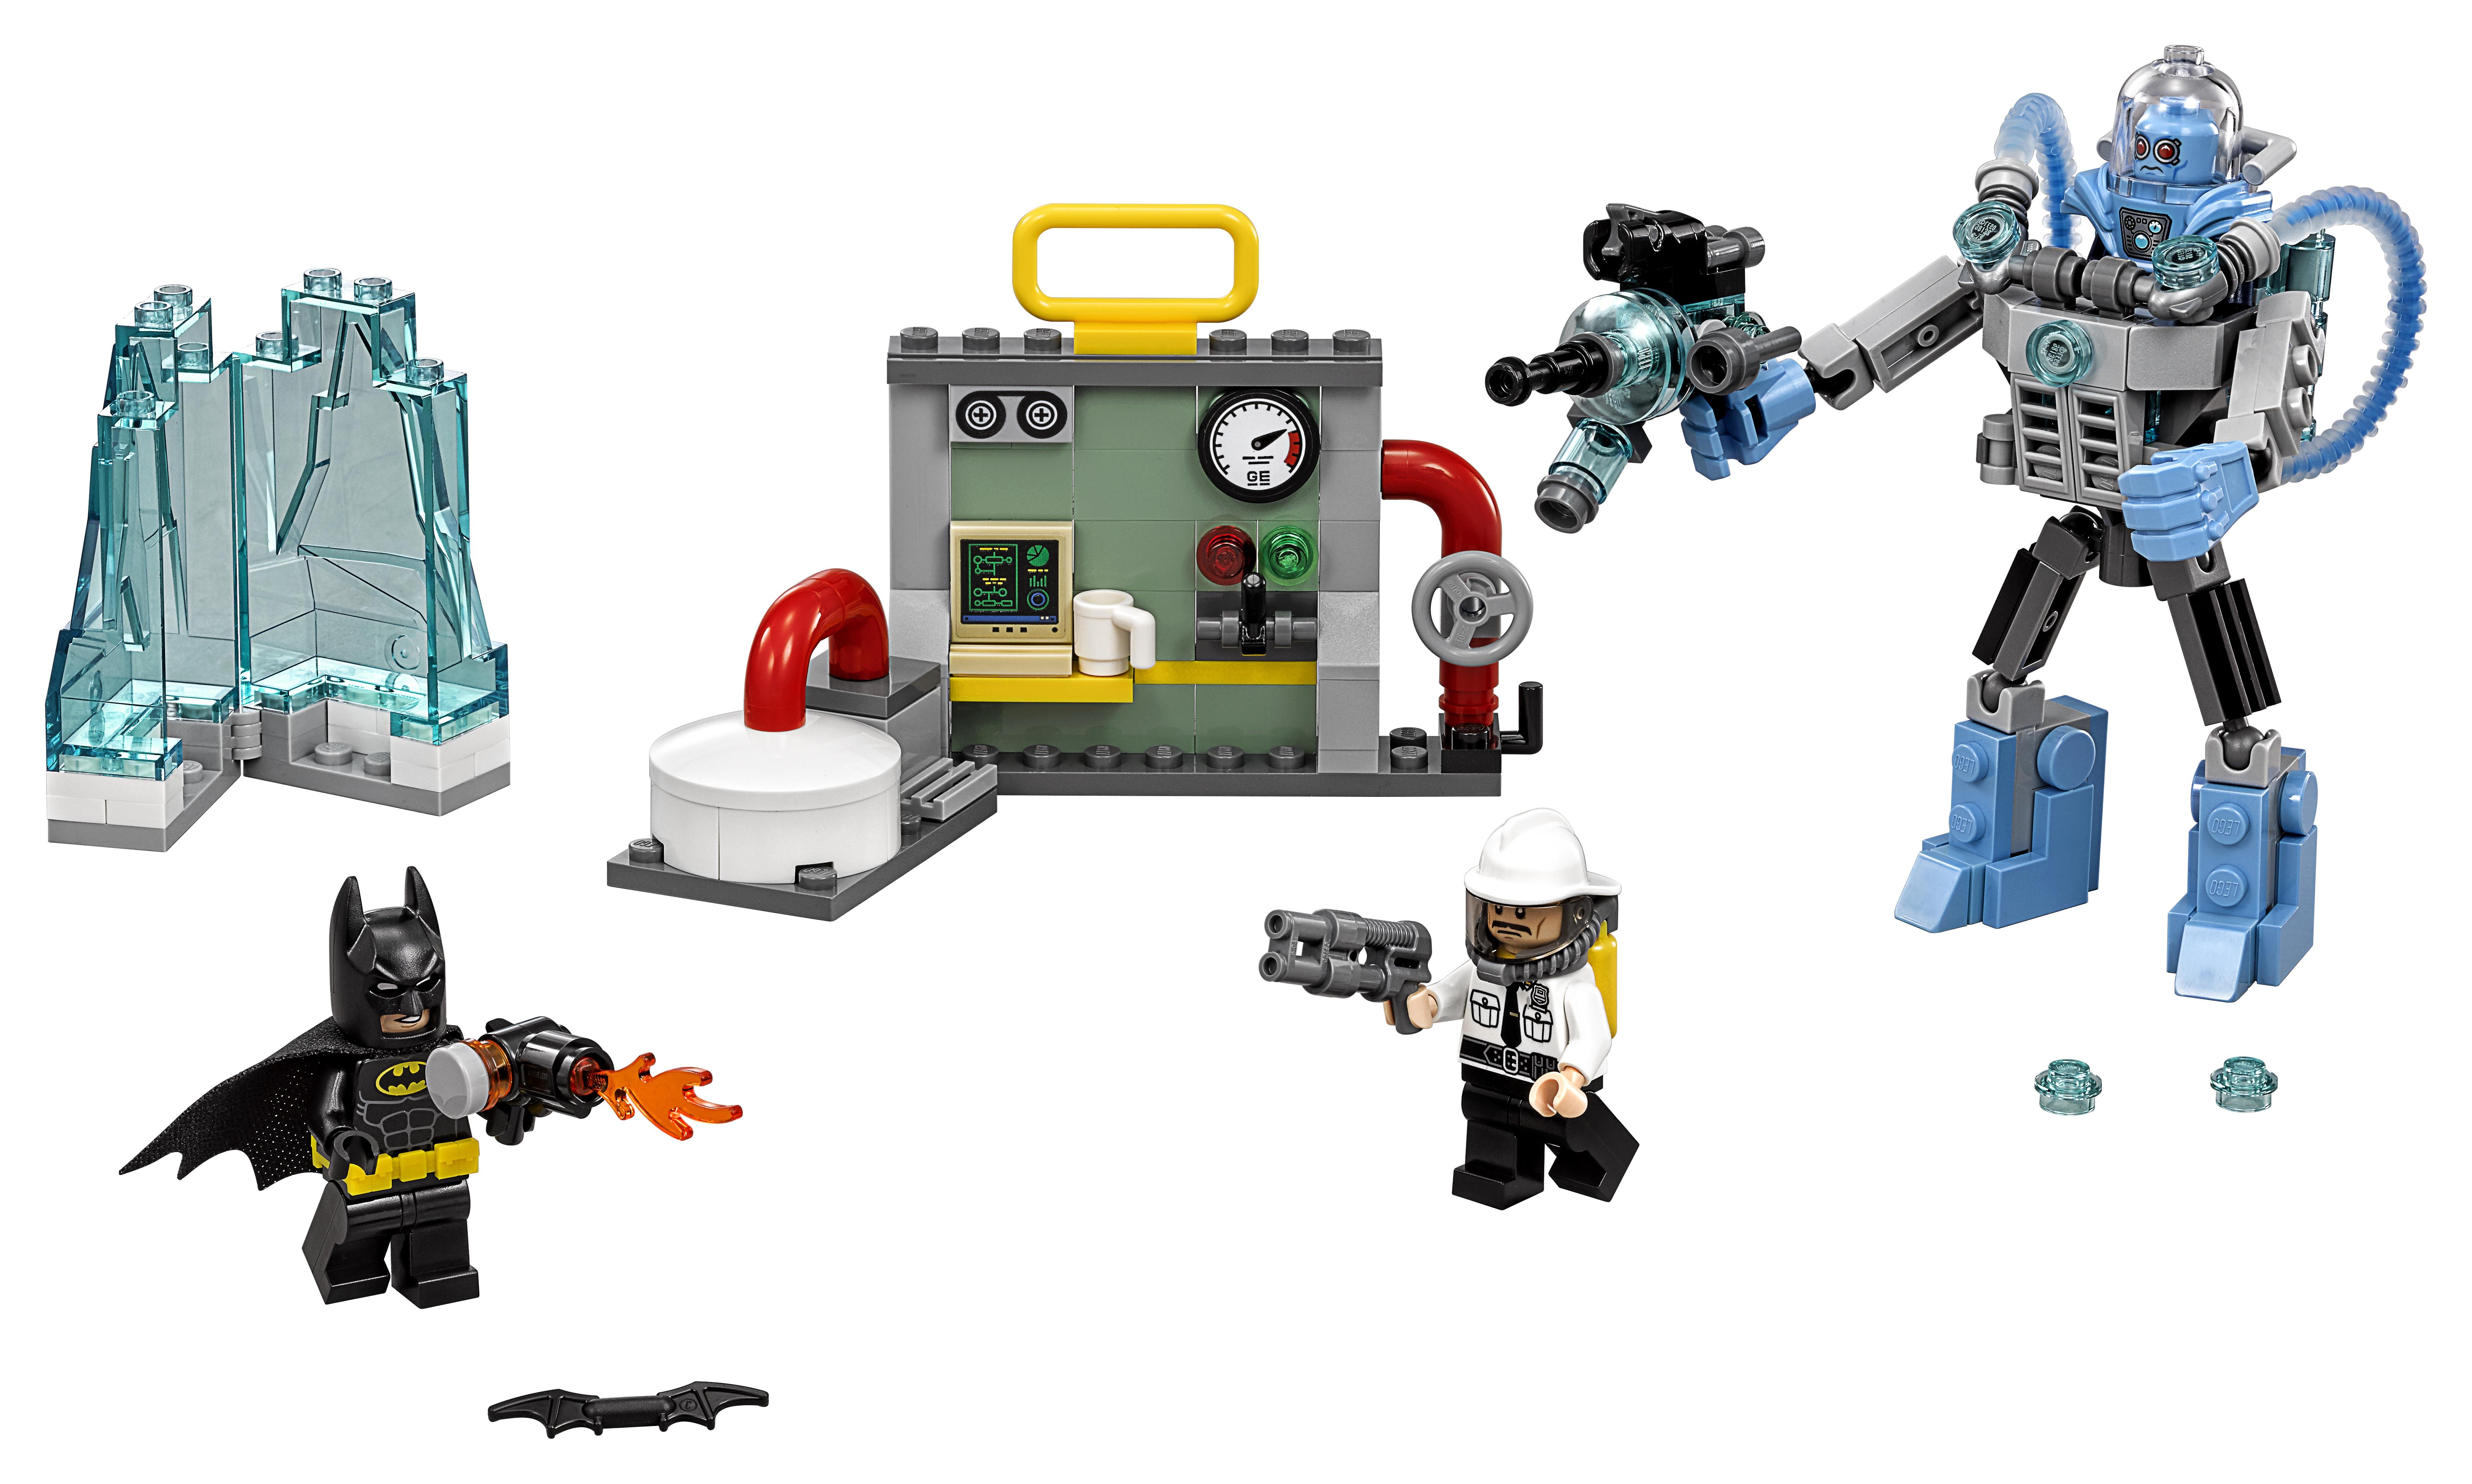 LEGO LEGO Batman Movie 70901 Ледяная aтака Мистера Фриза lego juniors конструктор бэтмен против мистера фриза 10737